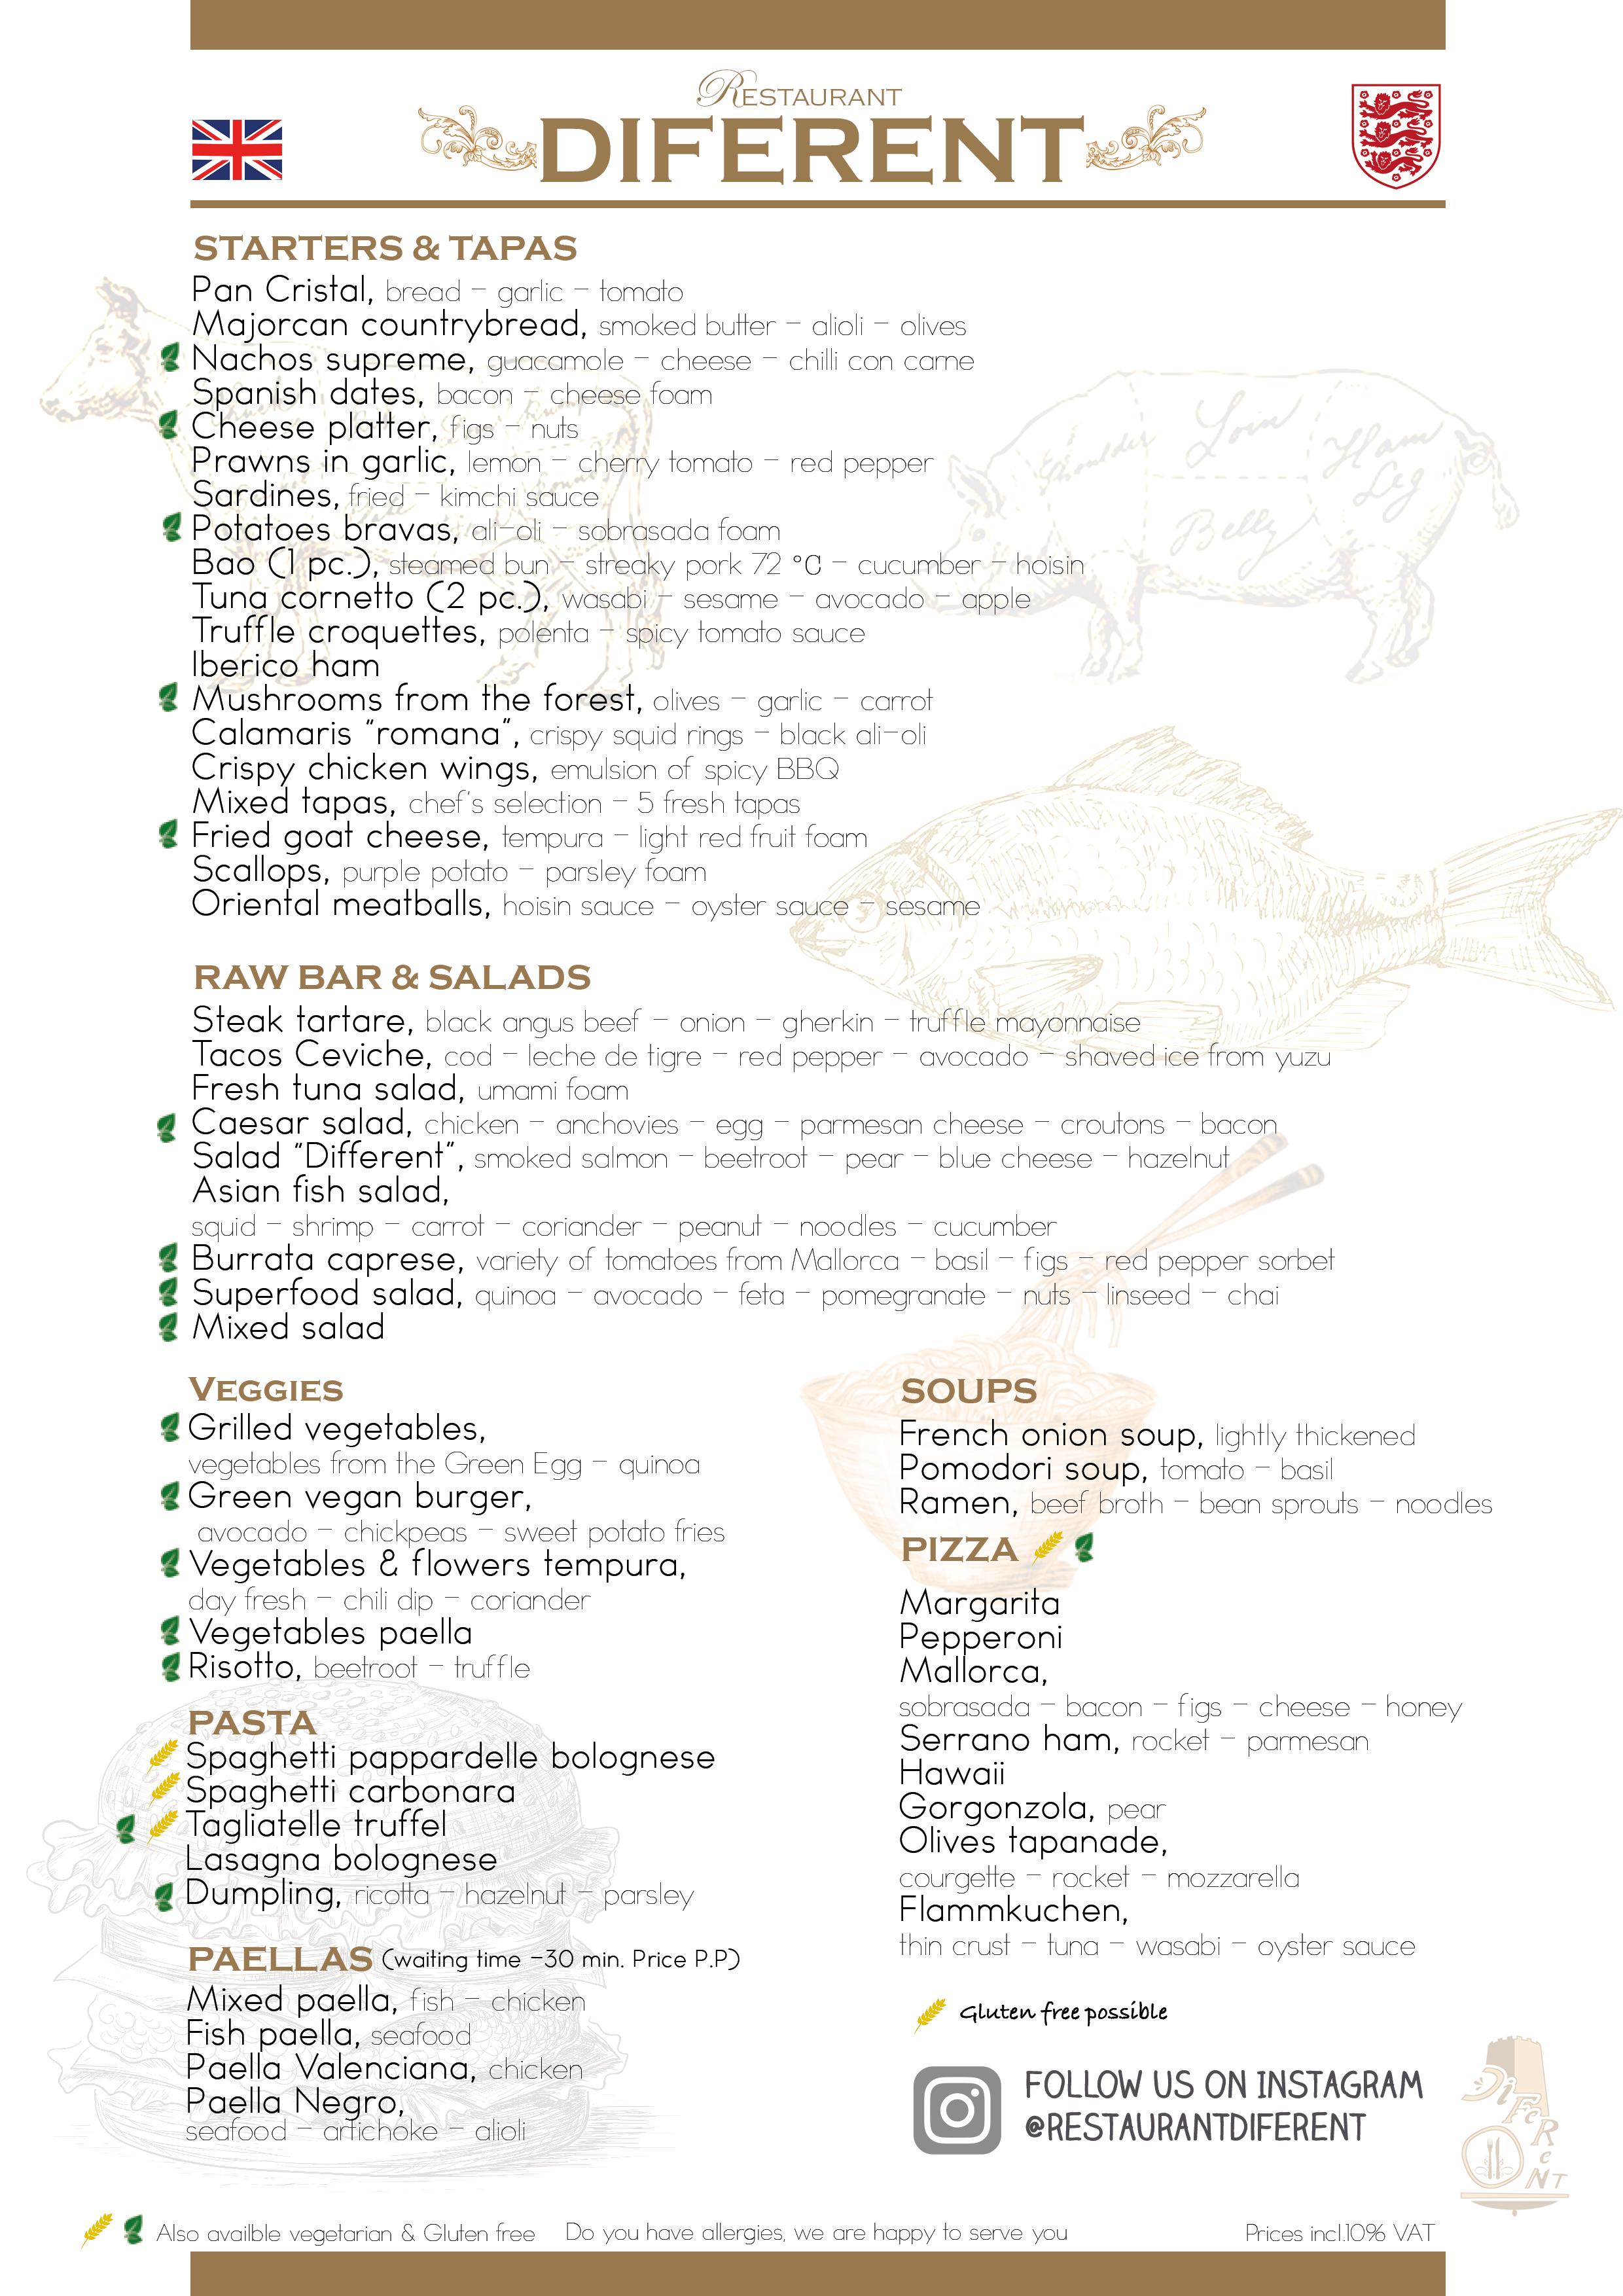 diferent_menu_EN_2018_noprices